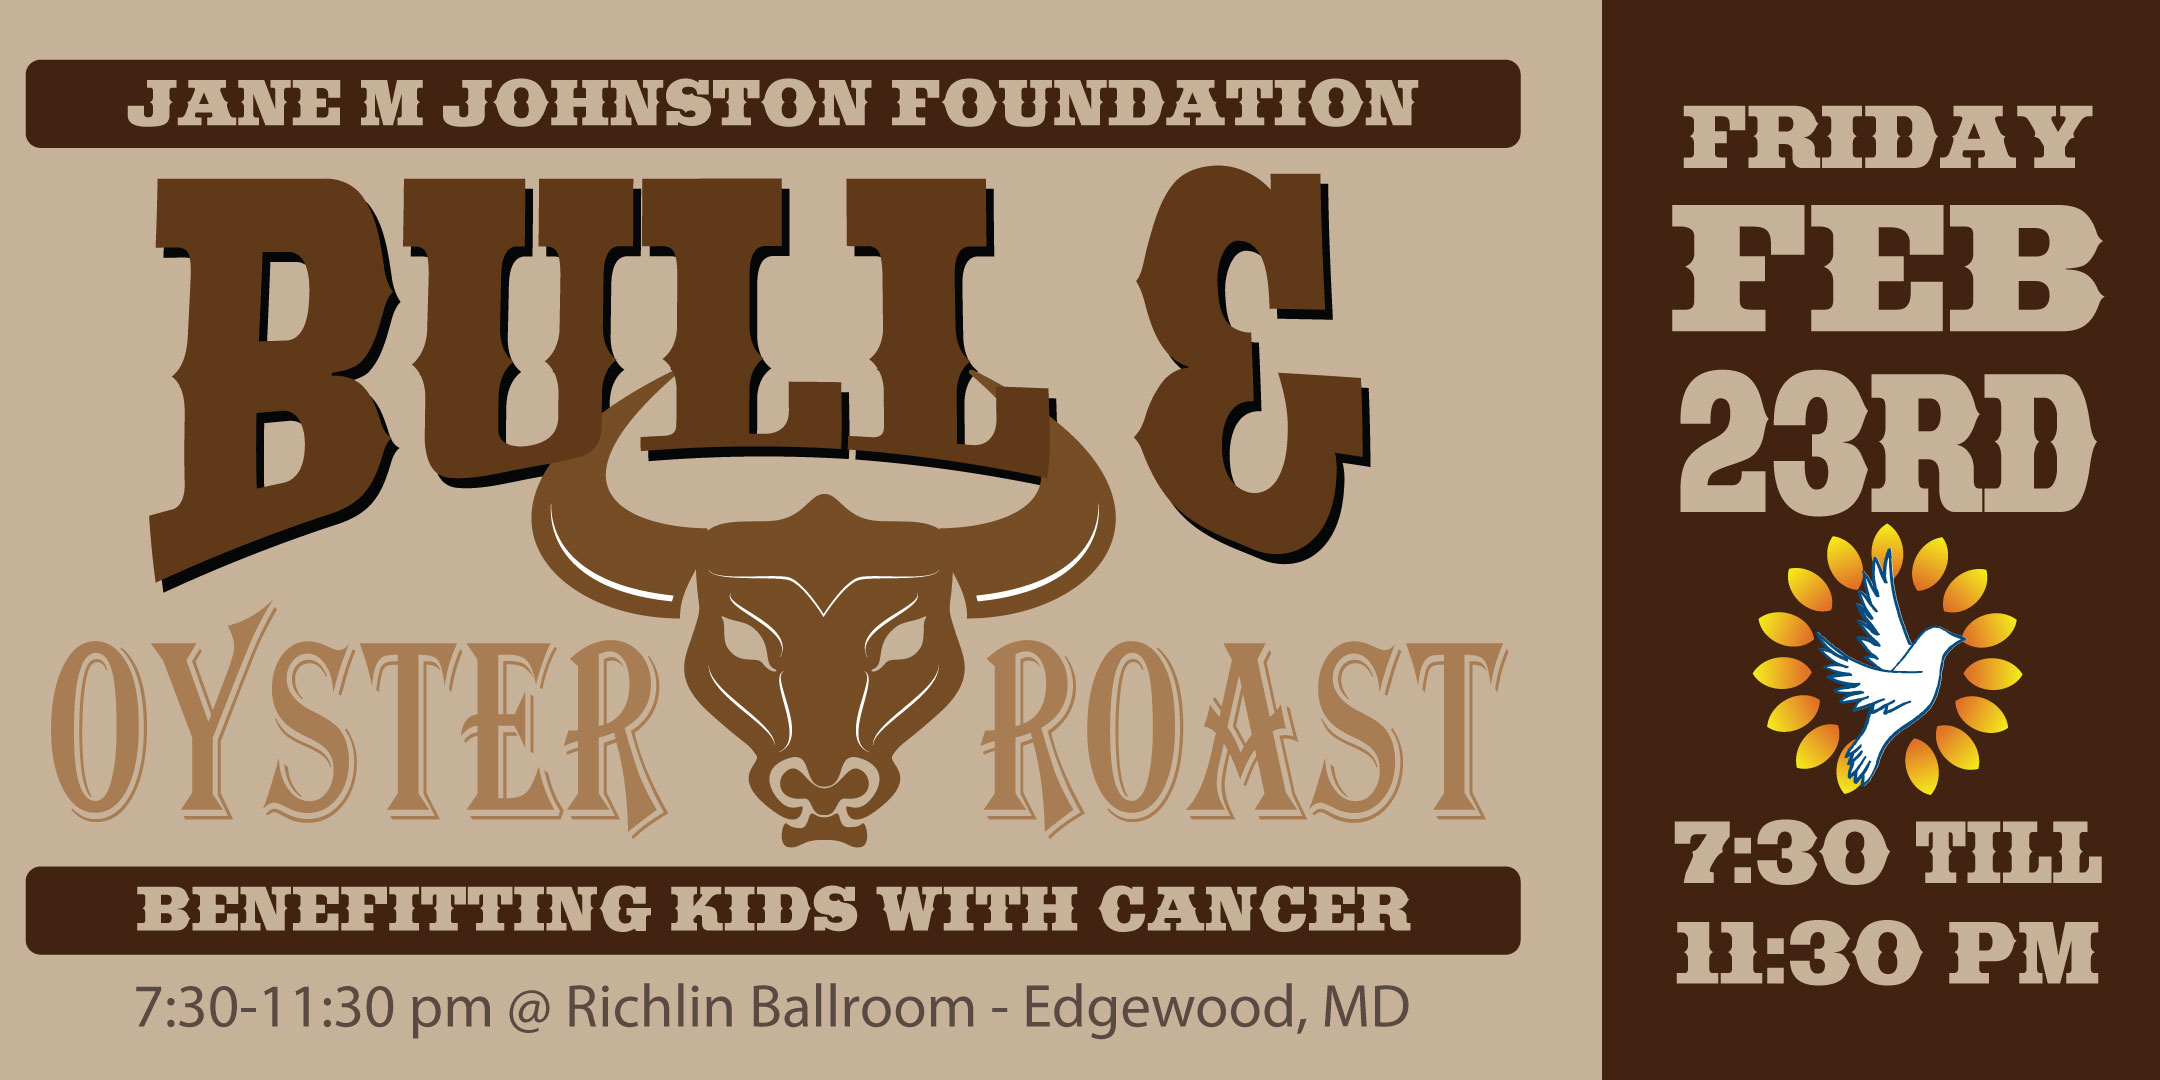 JMJ Bull Roast Invitation